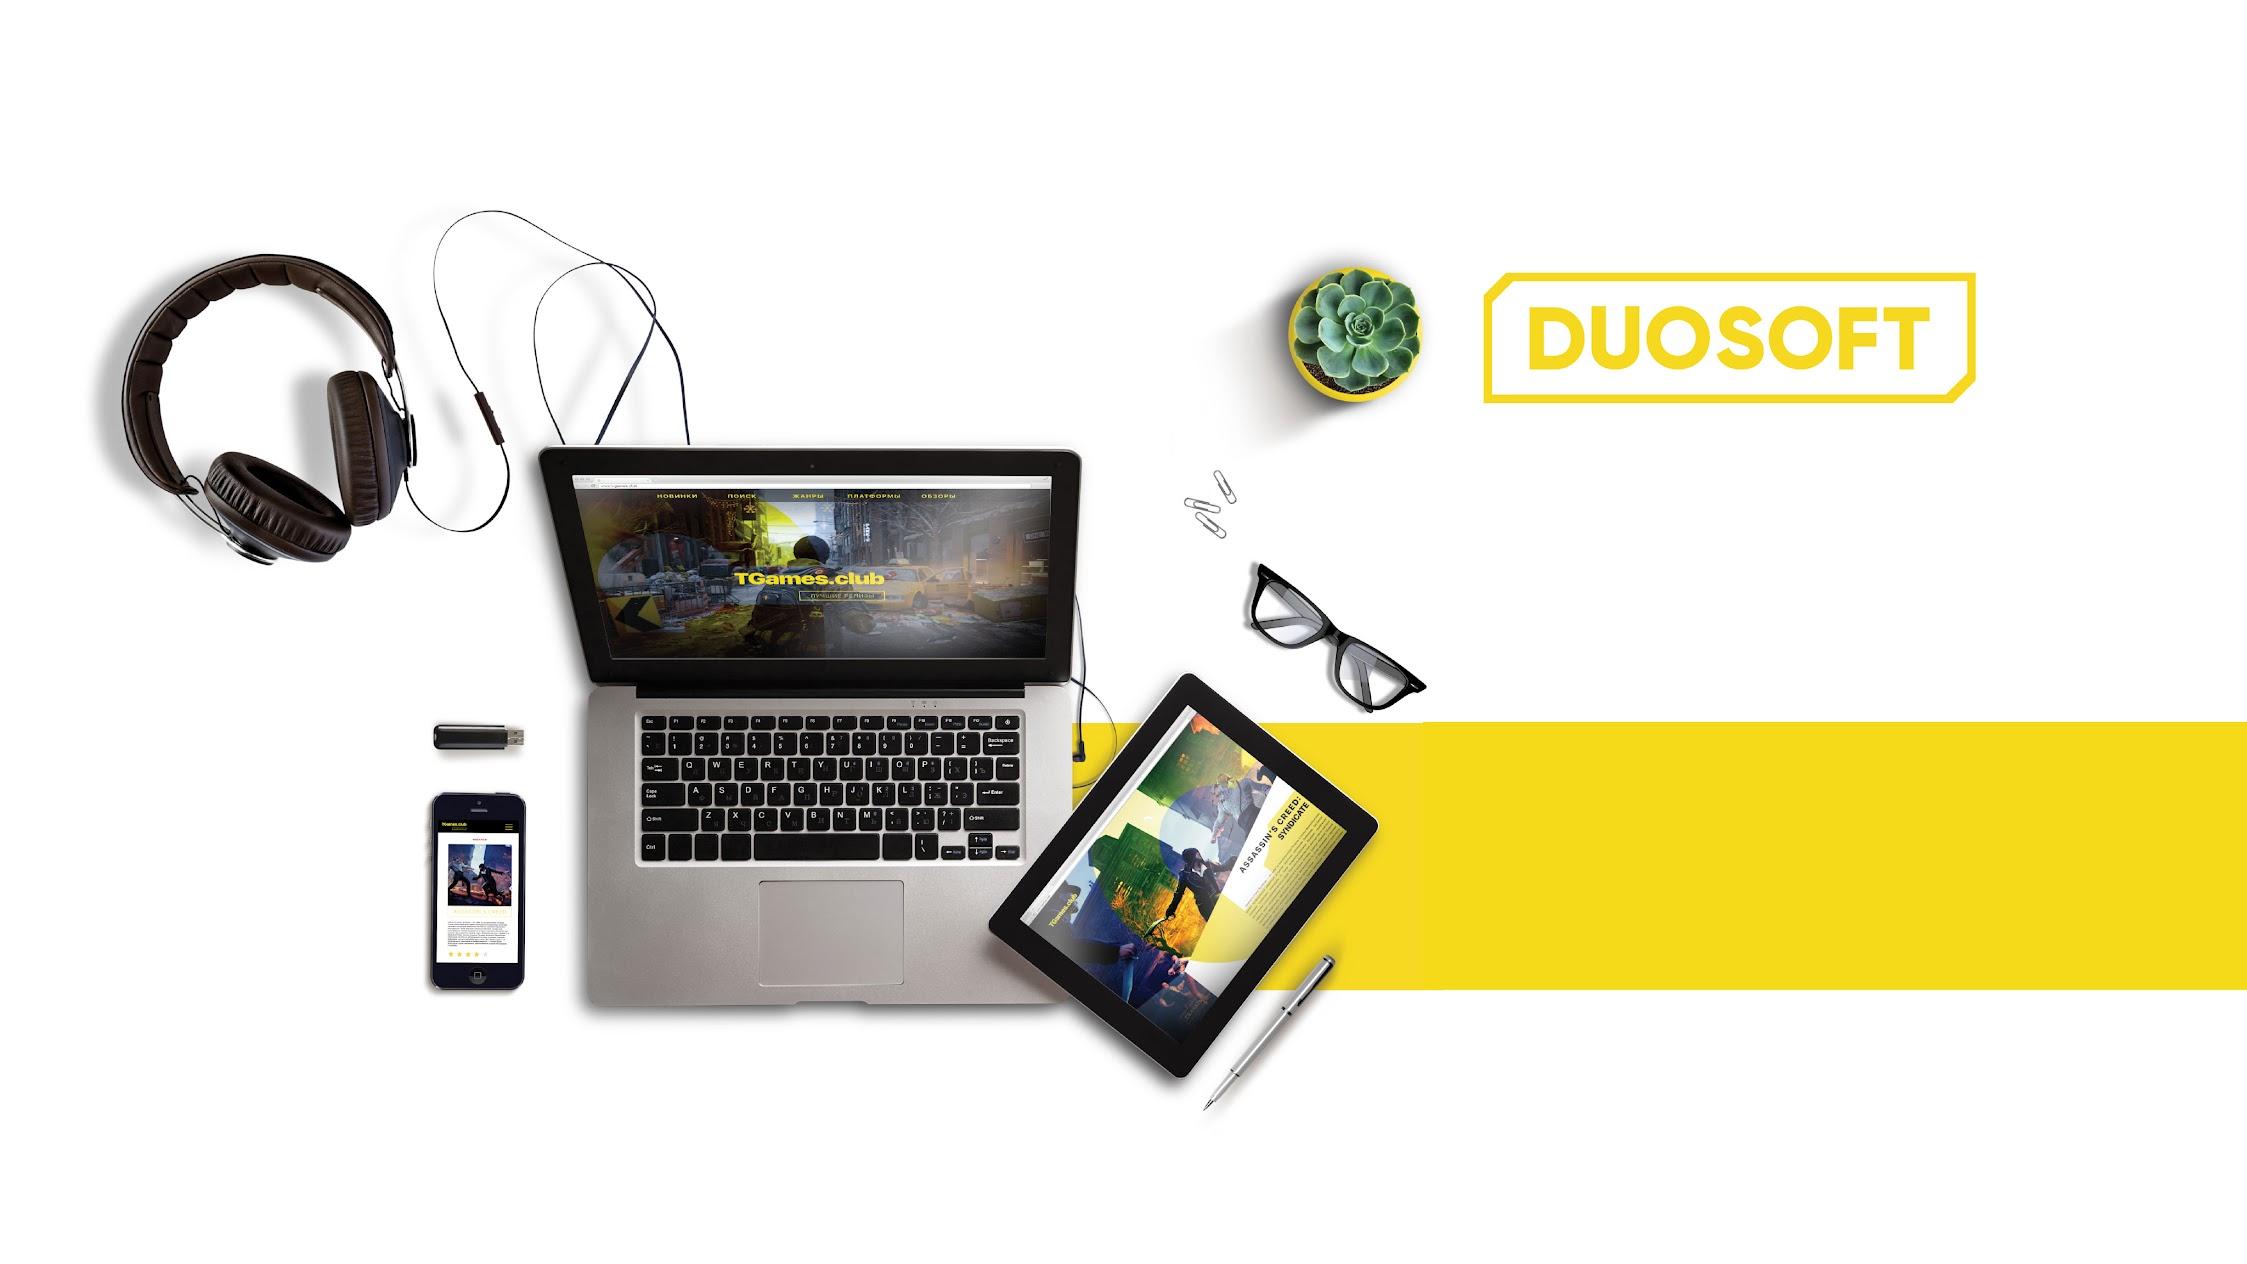 DuoSoft